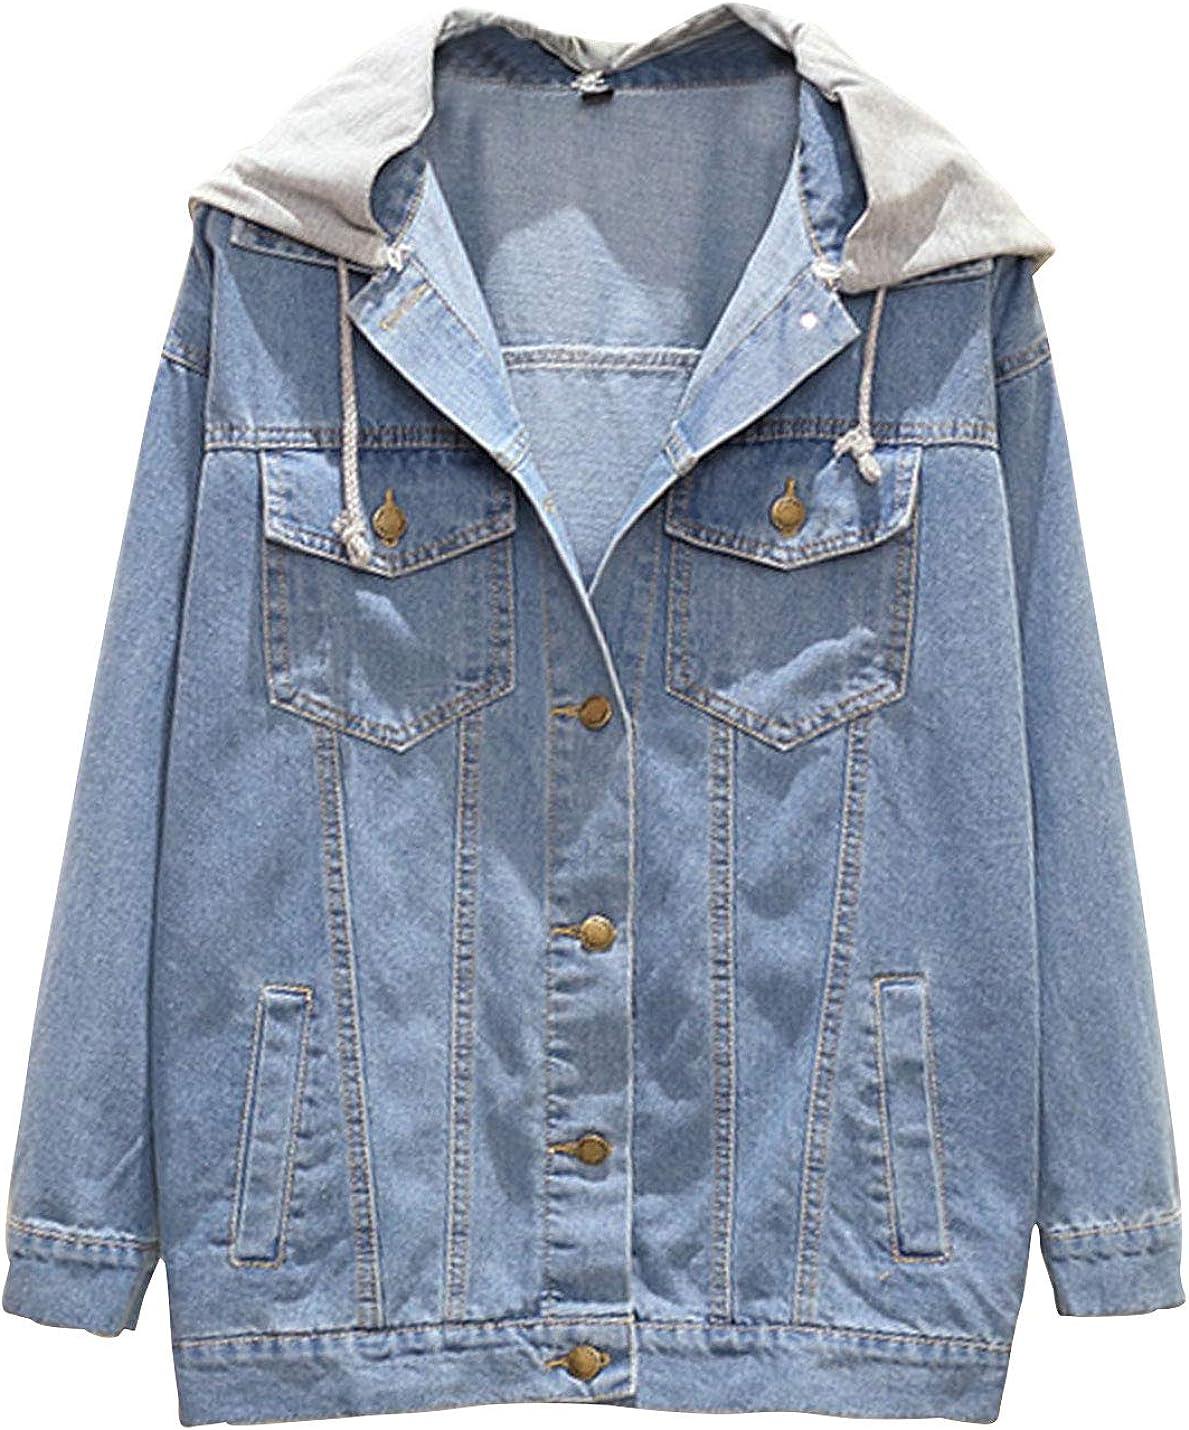 Omoone Women's Loose Washed Ripped Drawstring Hooded Denim Trucker Jean Jacket